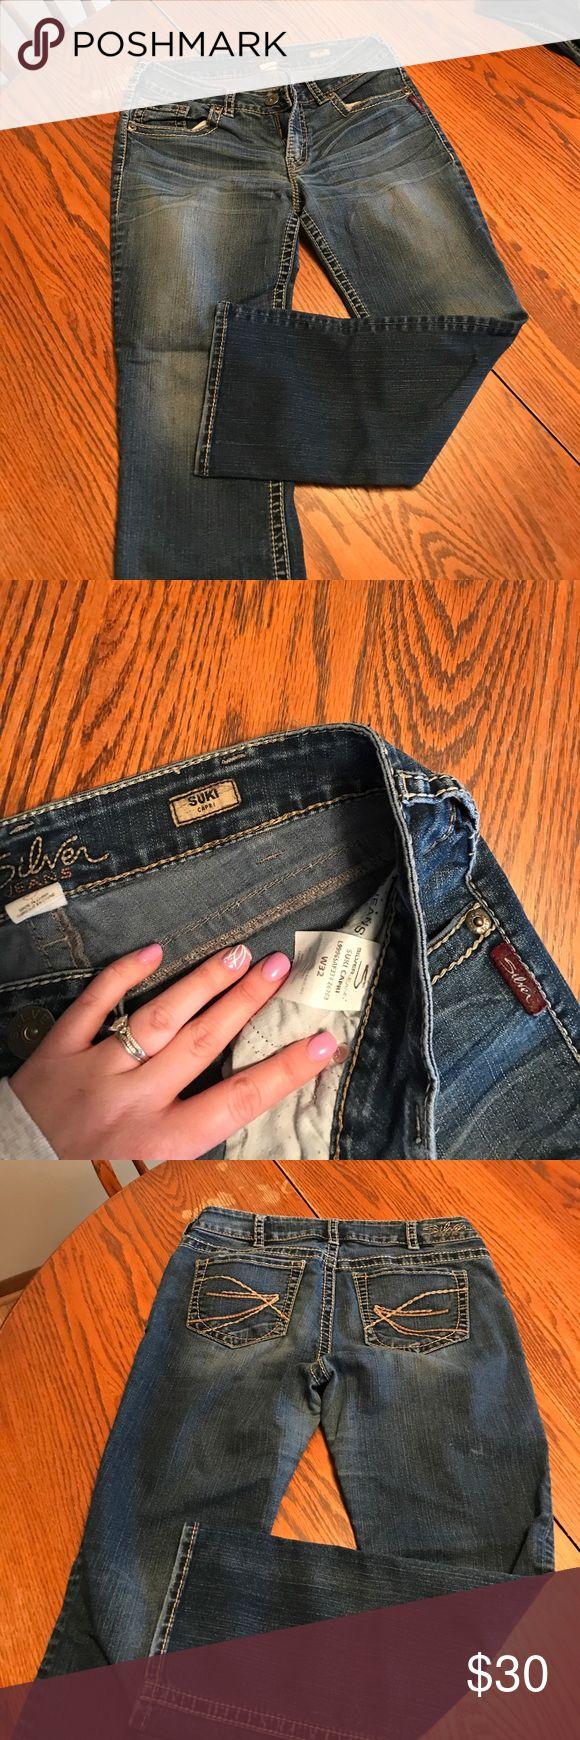 Silver capris Women's silver capris W32 Silver Jeans Jeans